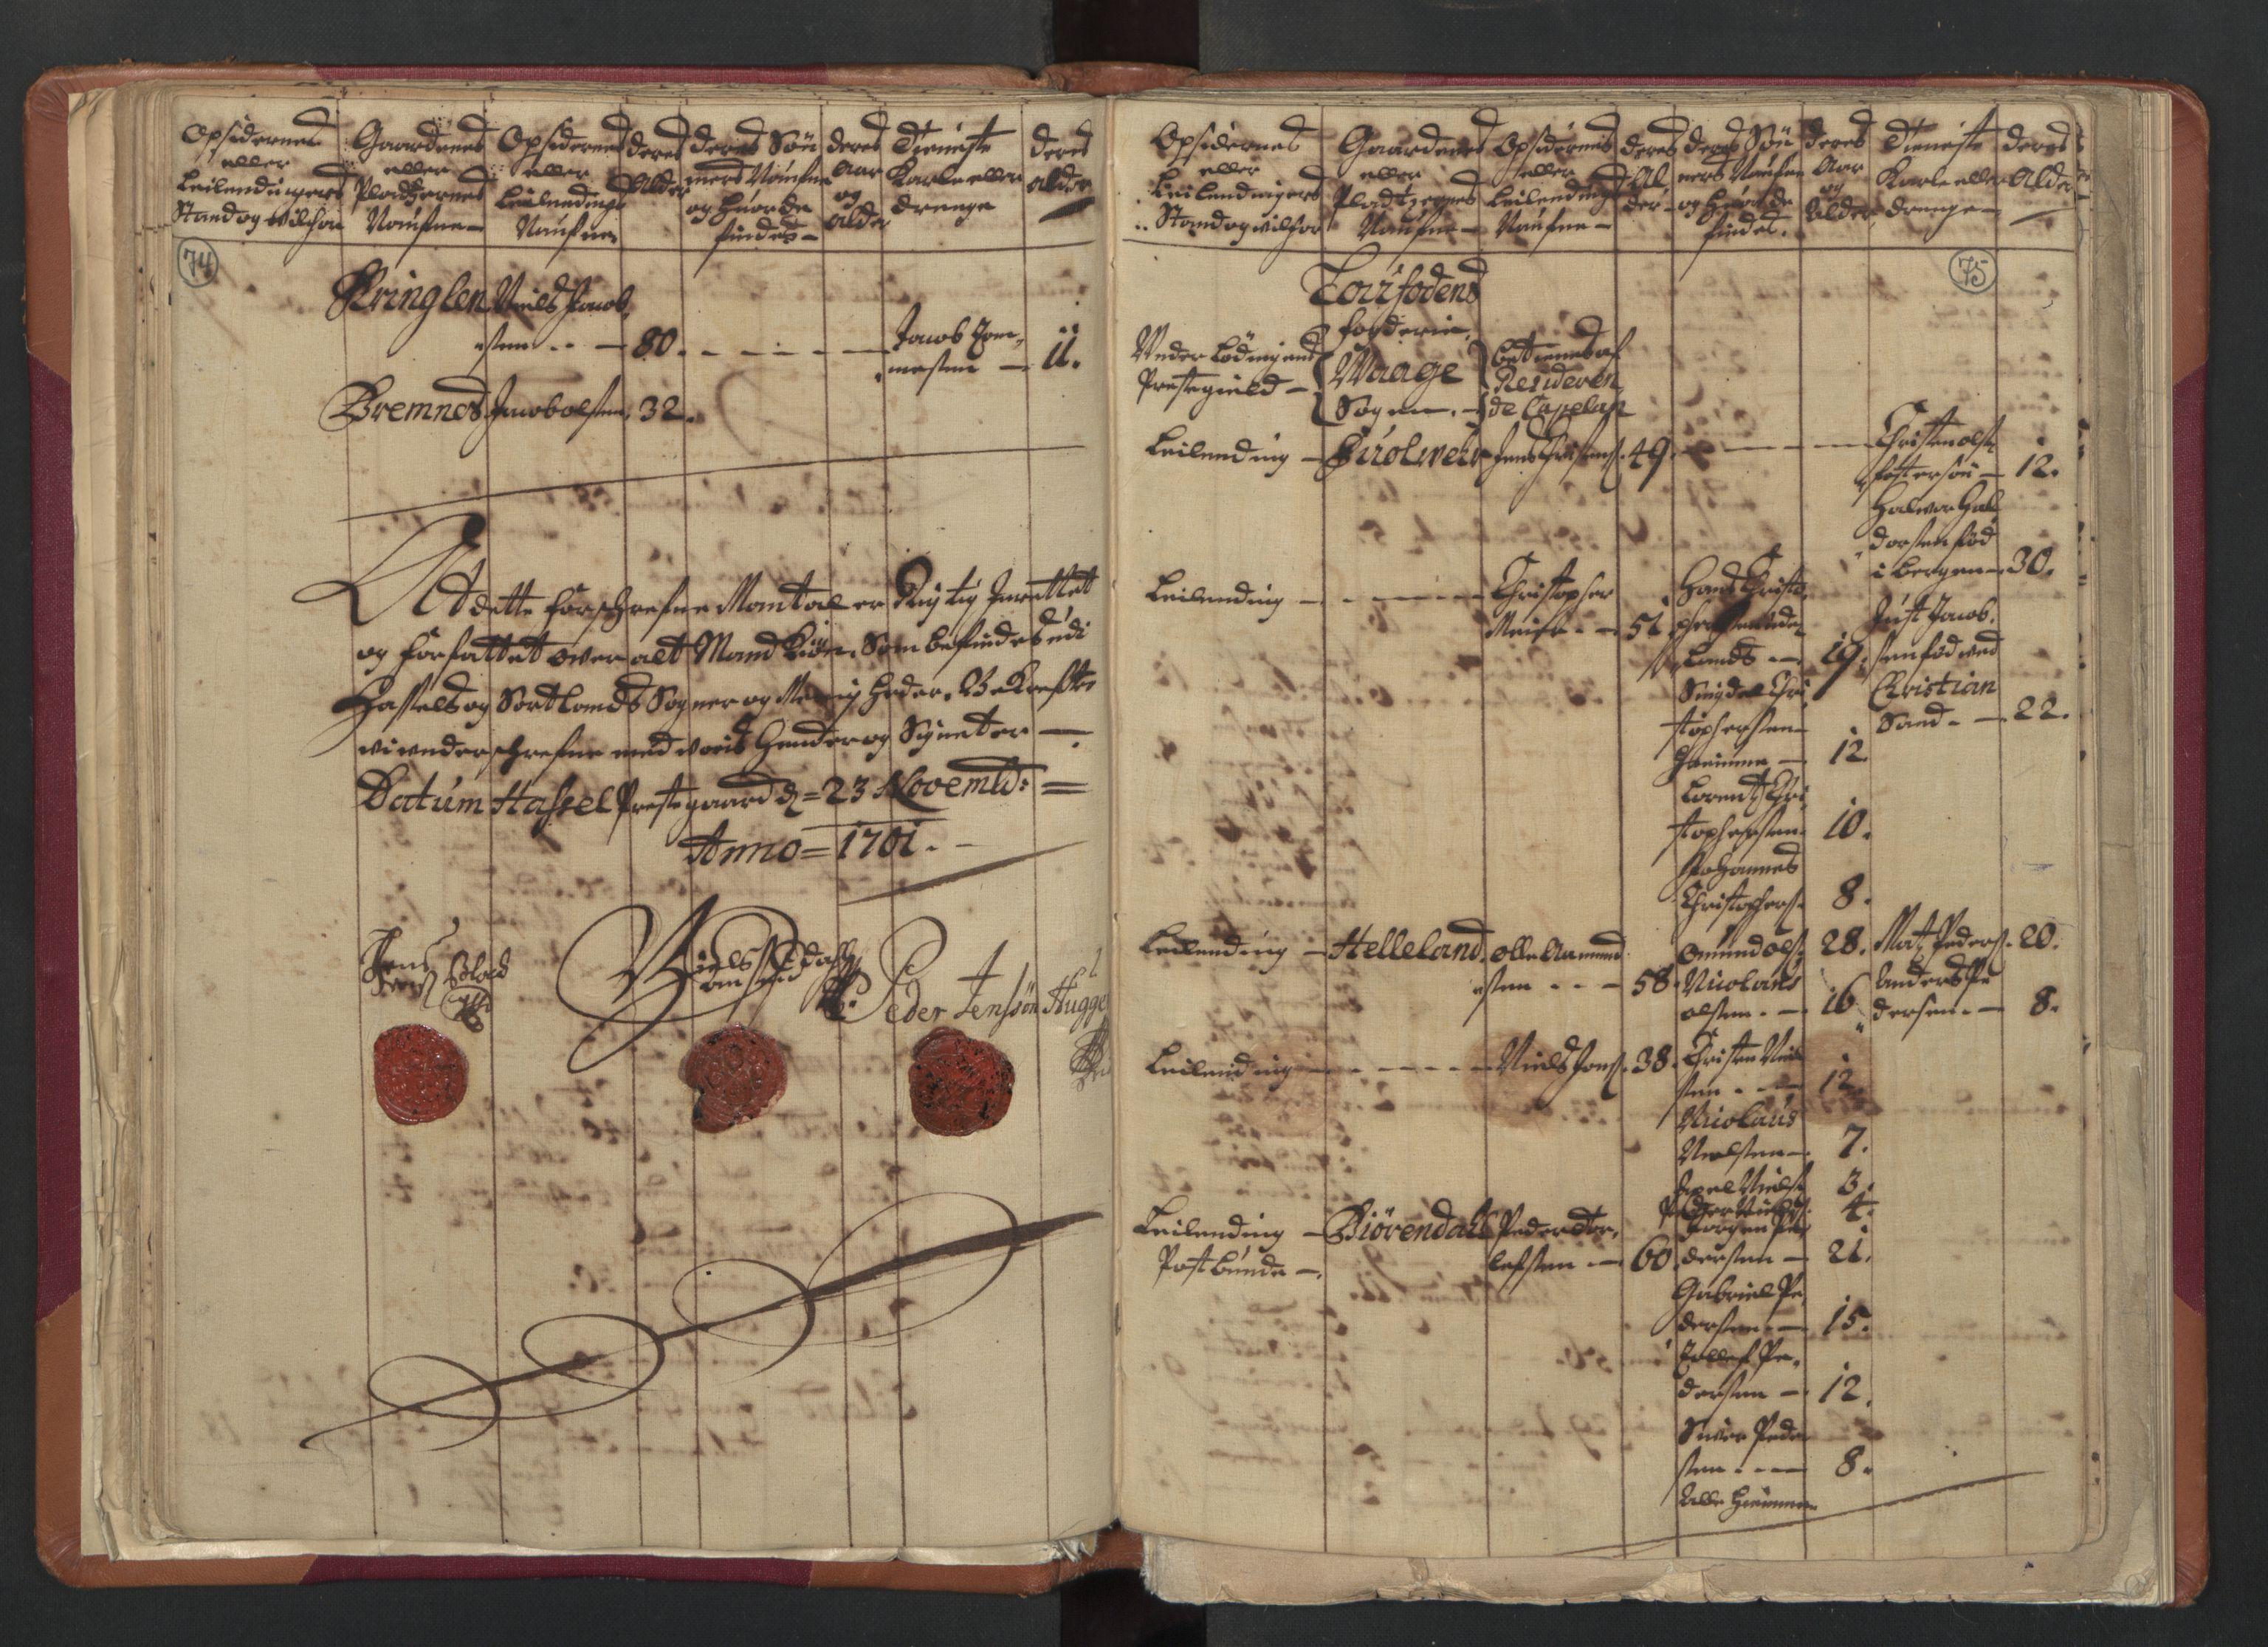 RA, Manntallet 1701, nr. 18: Vesterålen, Andenes og Lofoten fogderi, 1701, s. 74-75